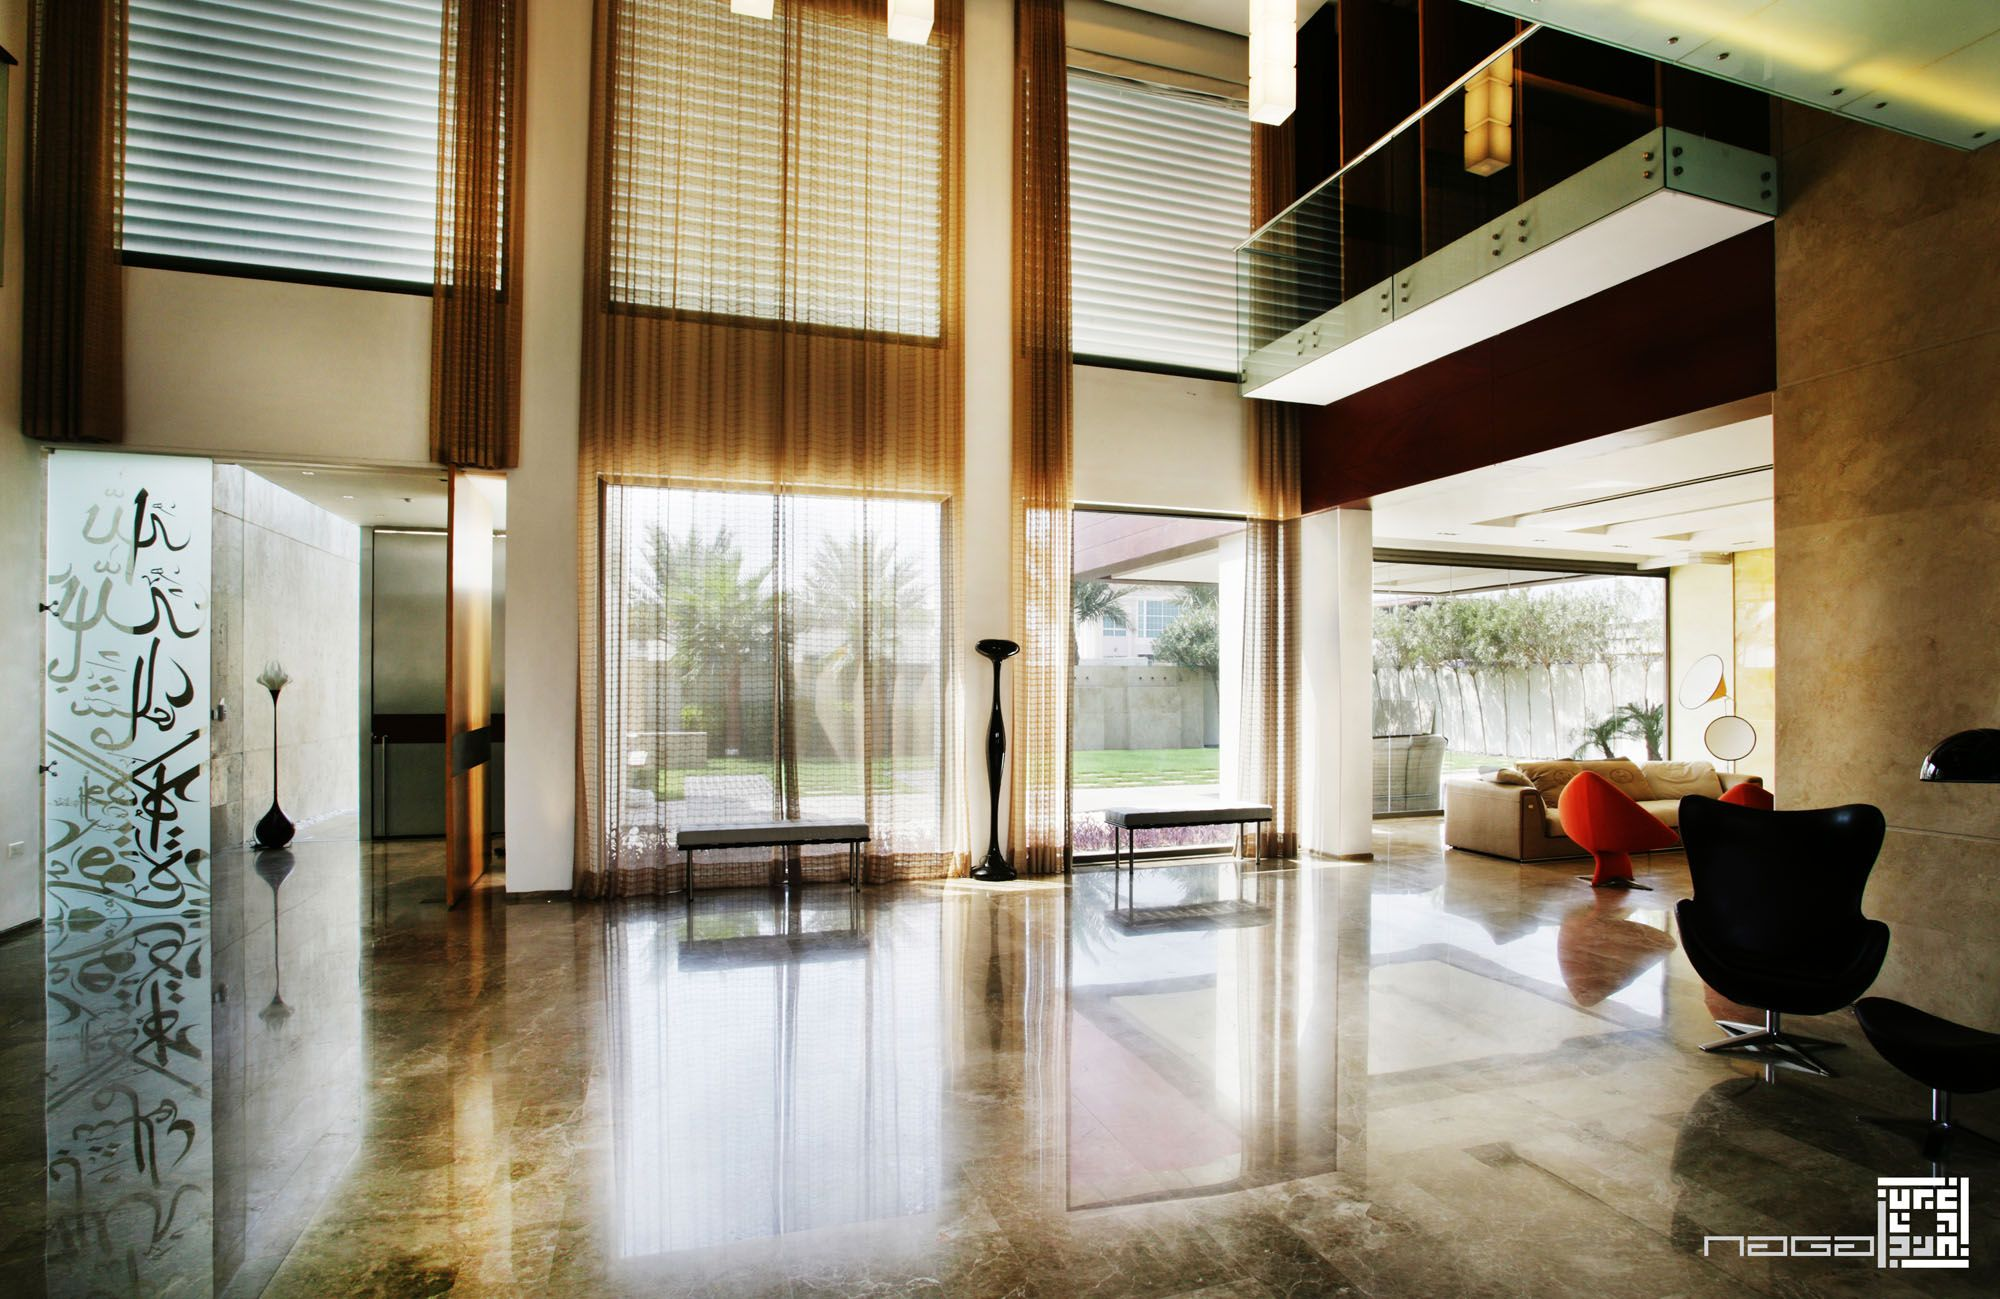 Fatima house by jorge hernandez de la garza interiors open living area and architecture also rh pinterest